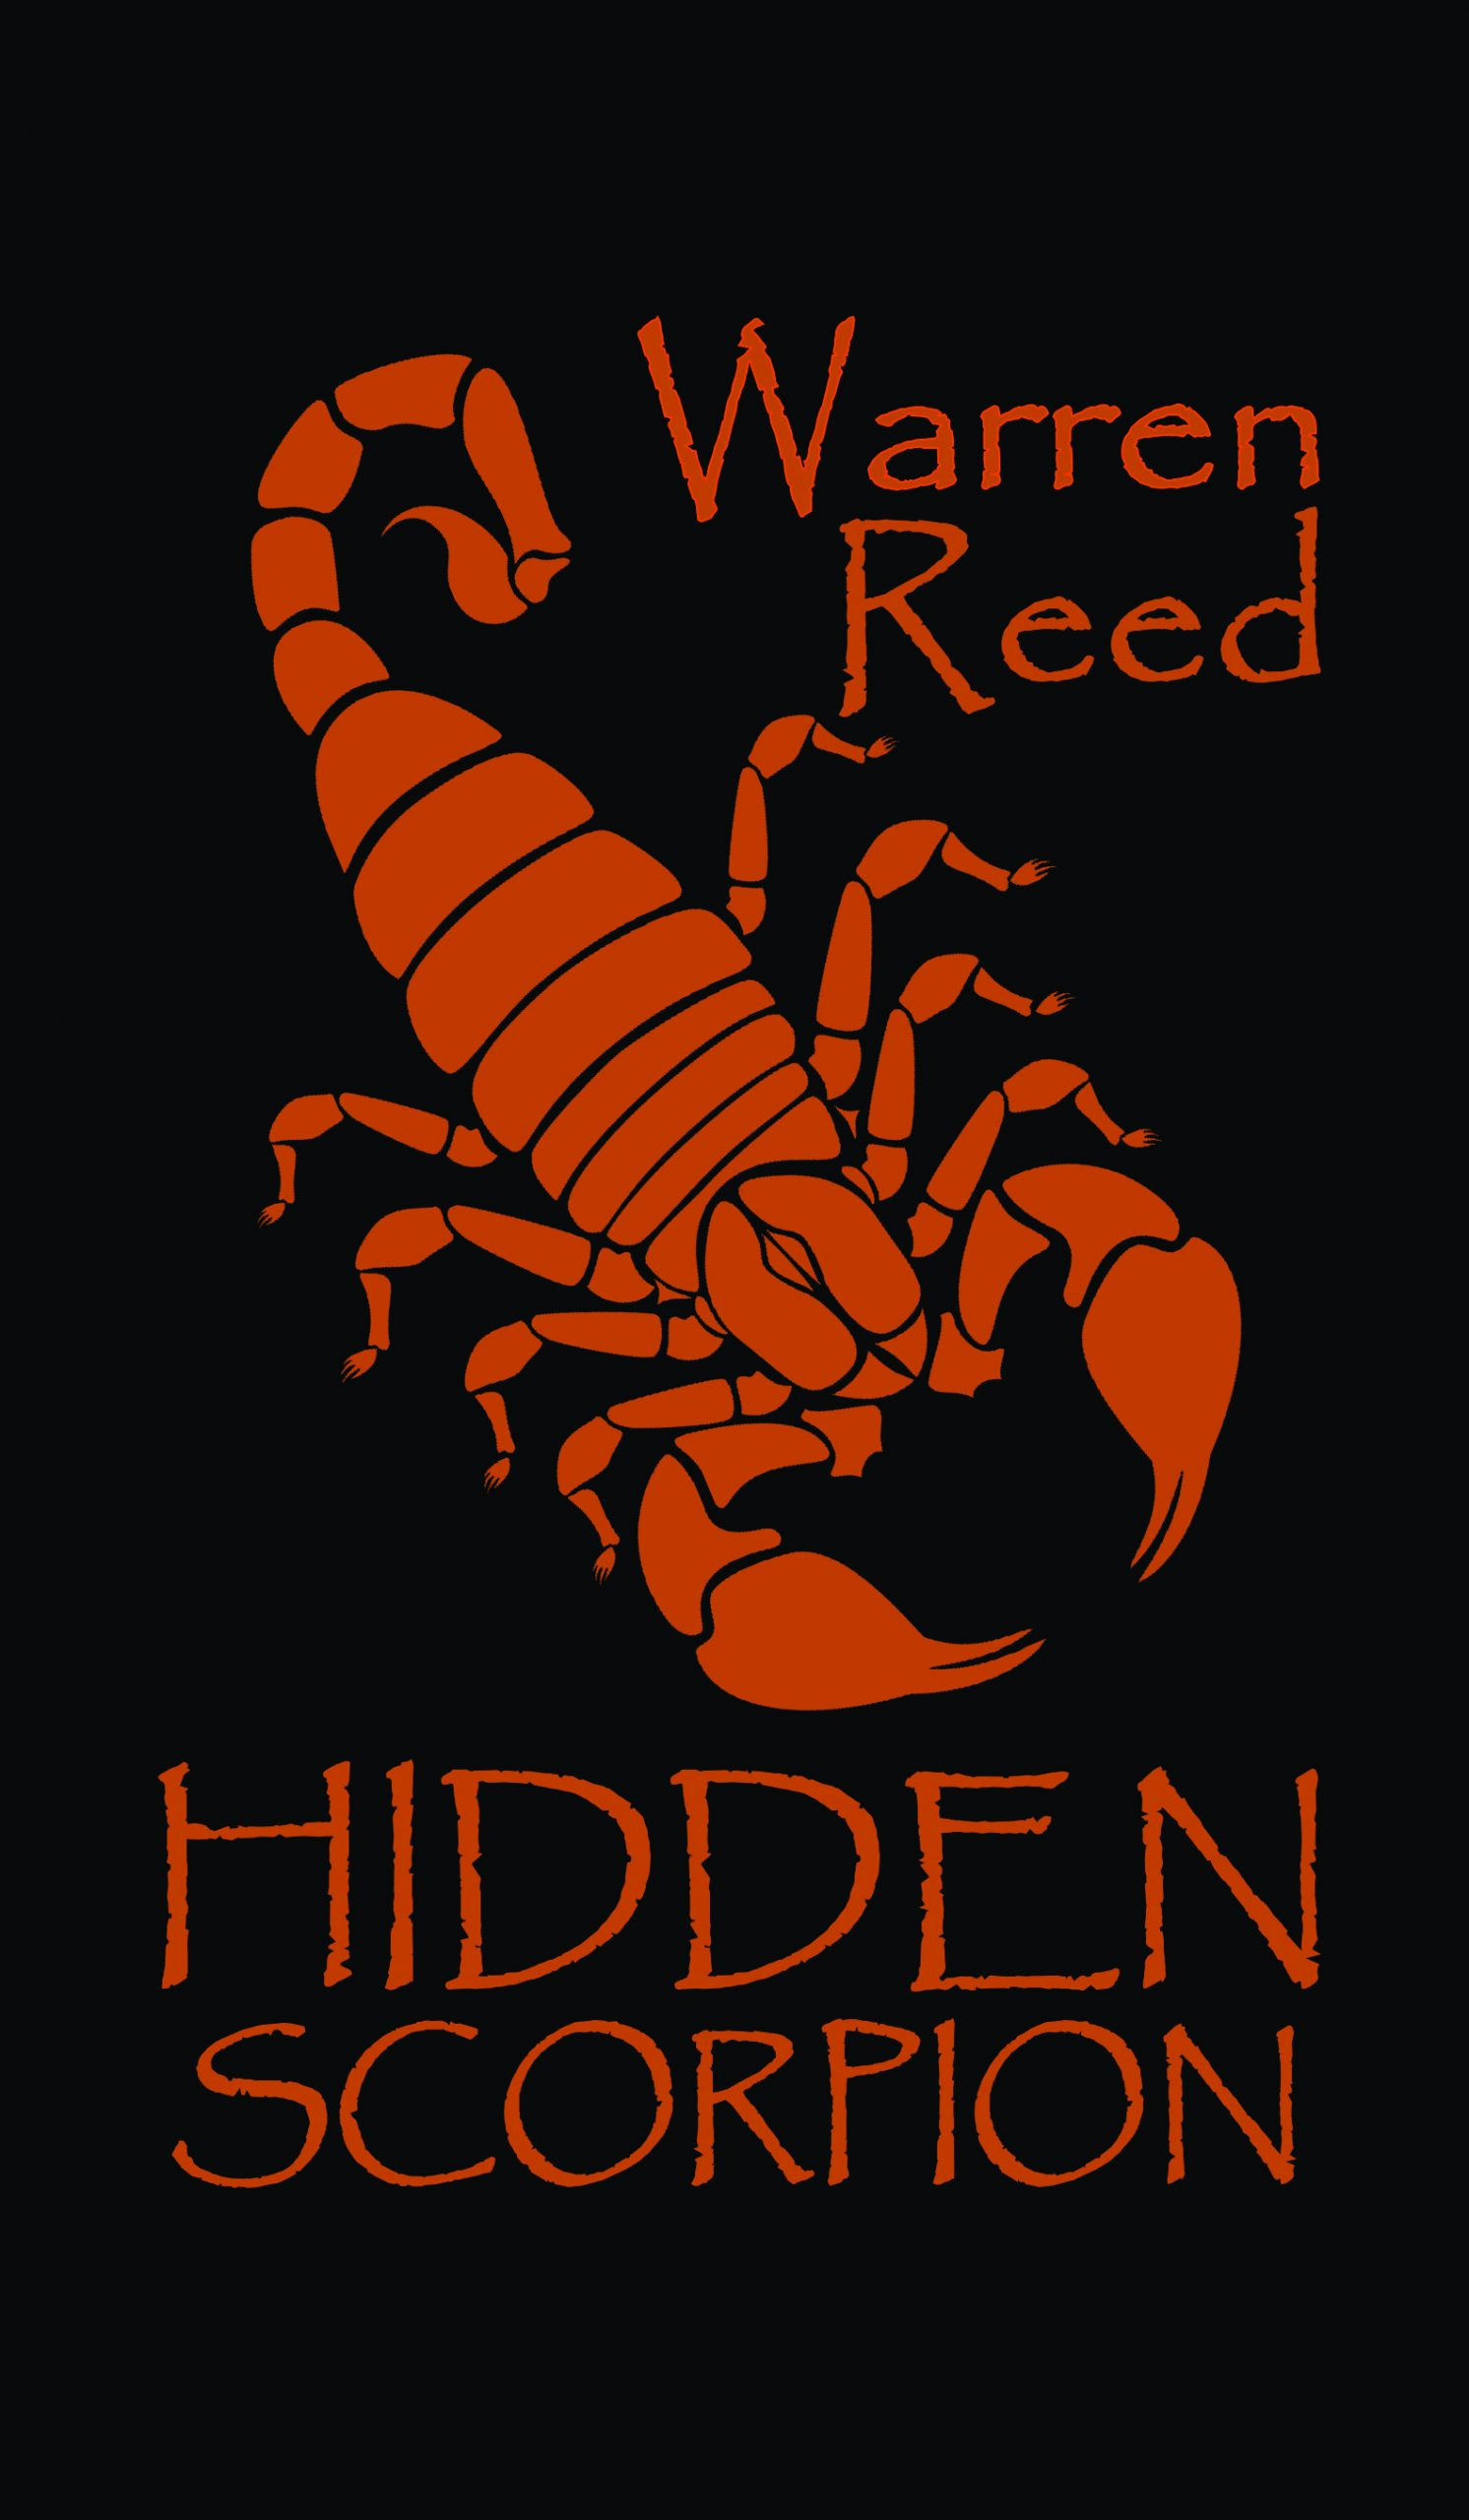 Hidden Scorpion